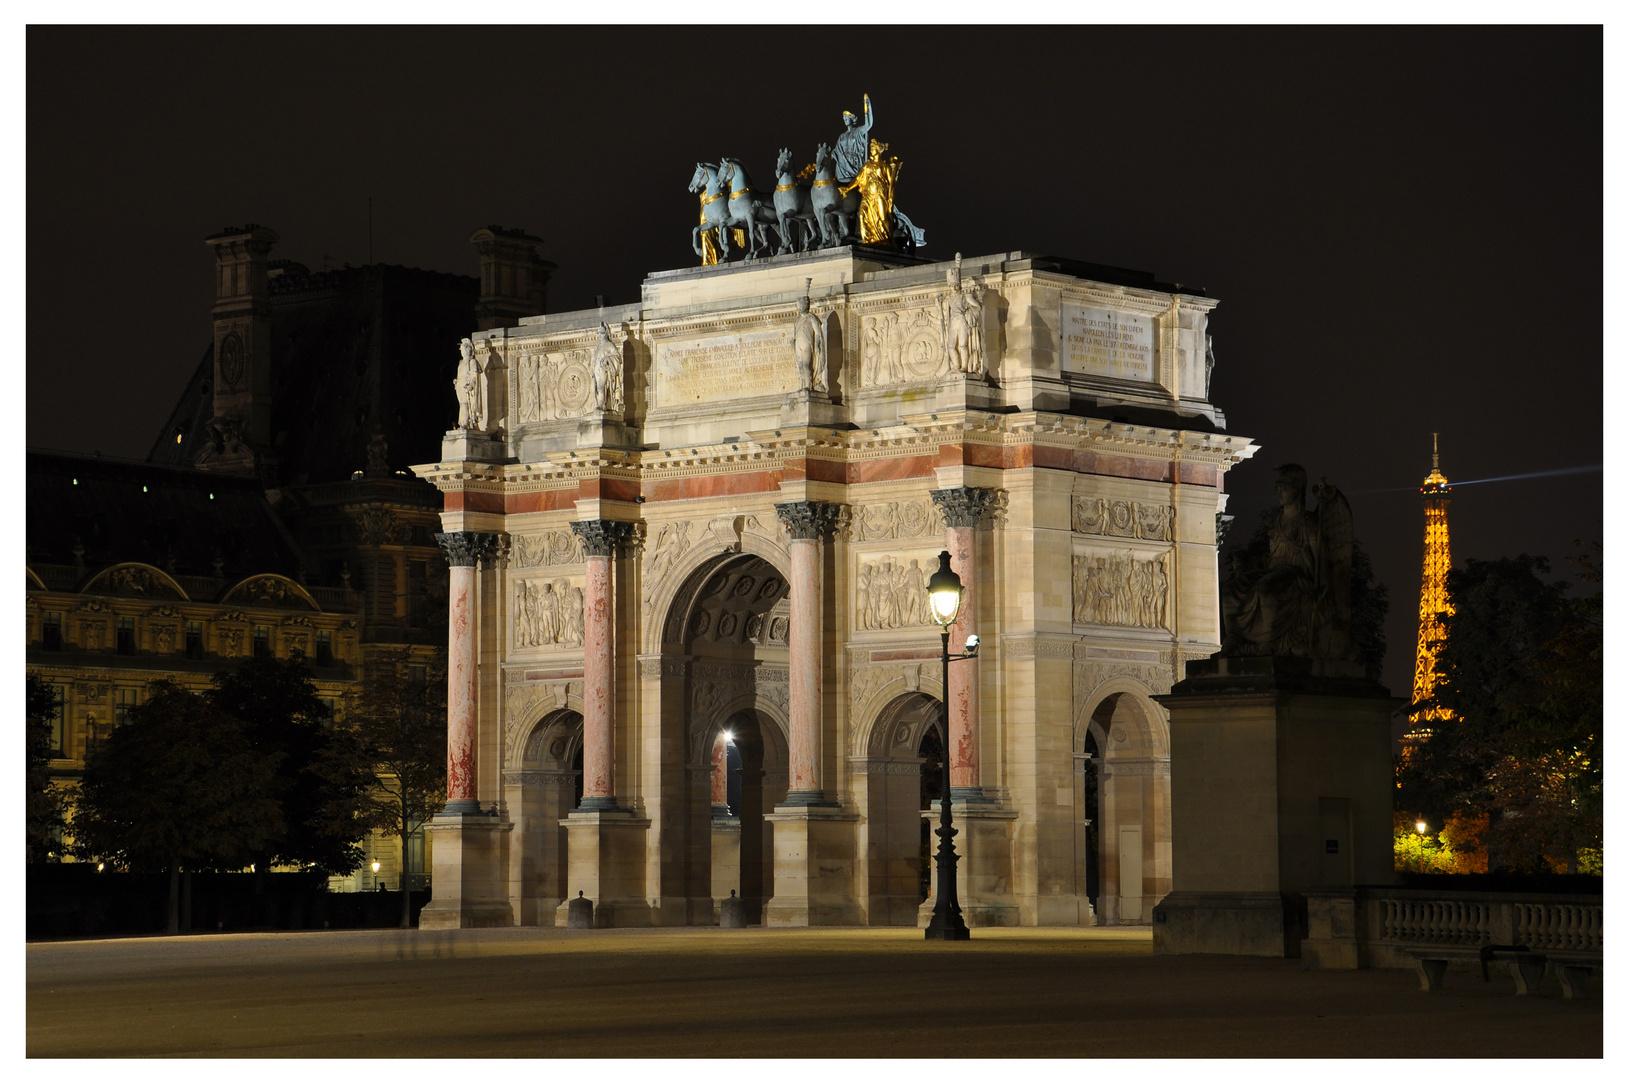 Am Louvre..